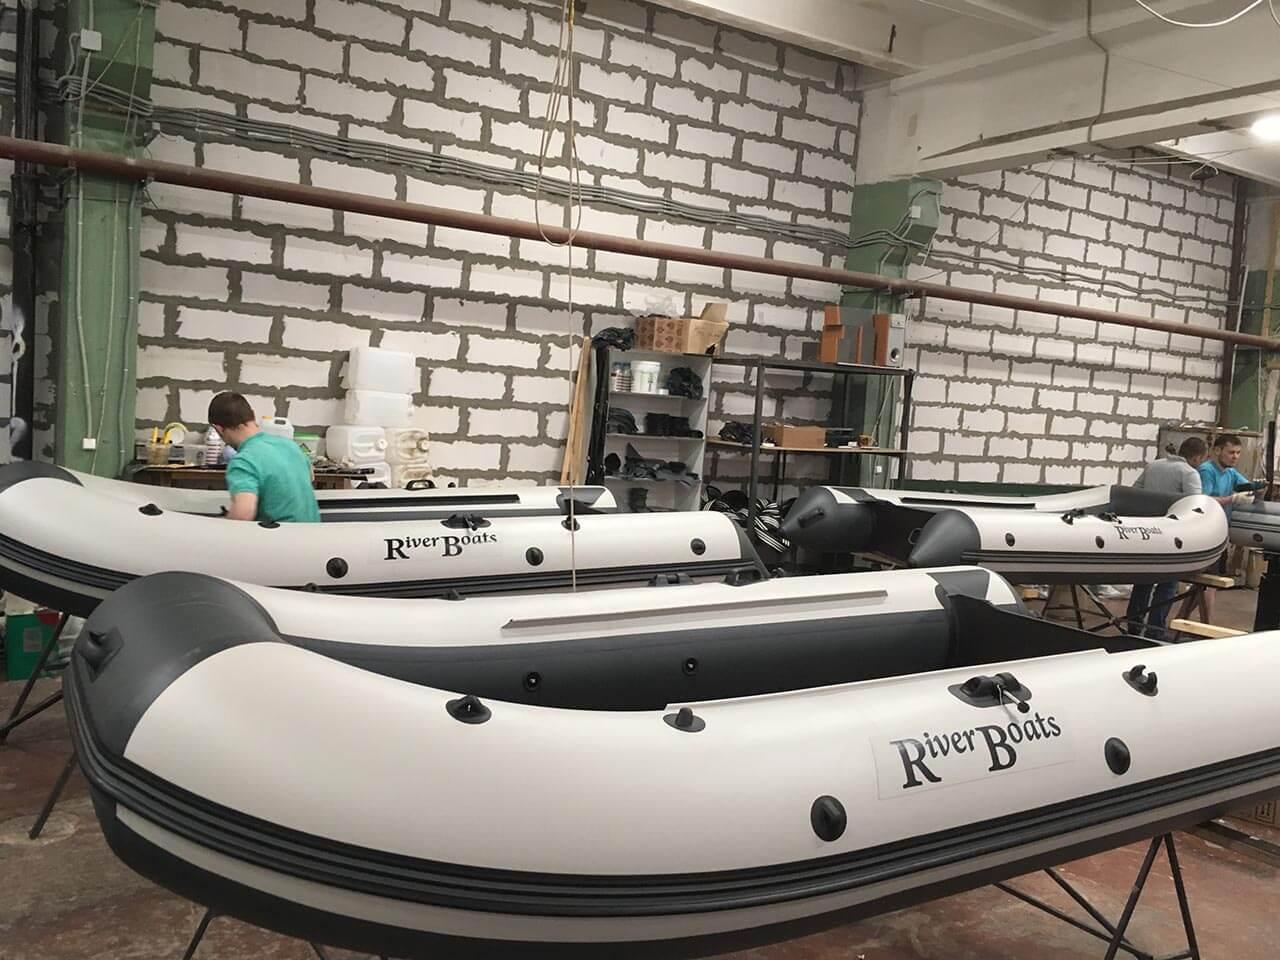 riverboats лодки официальный сайт